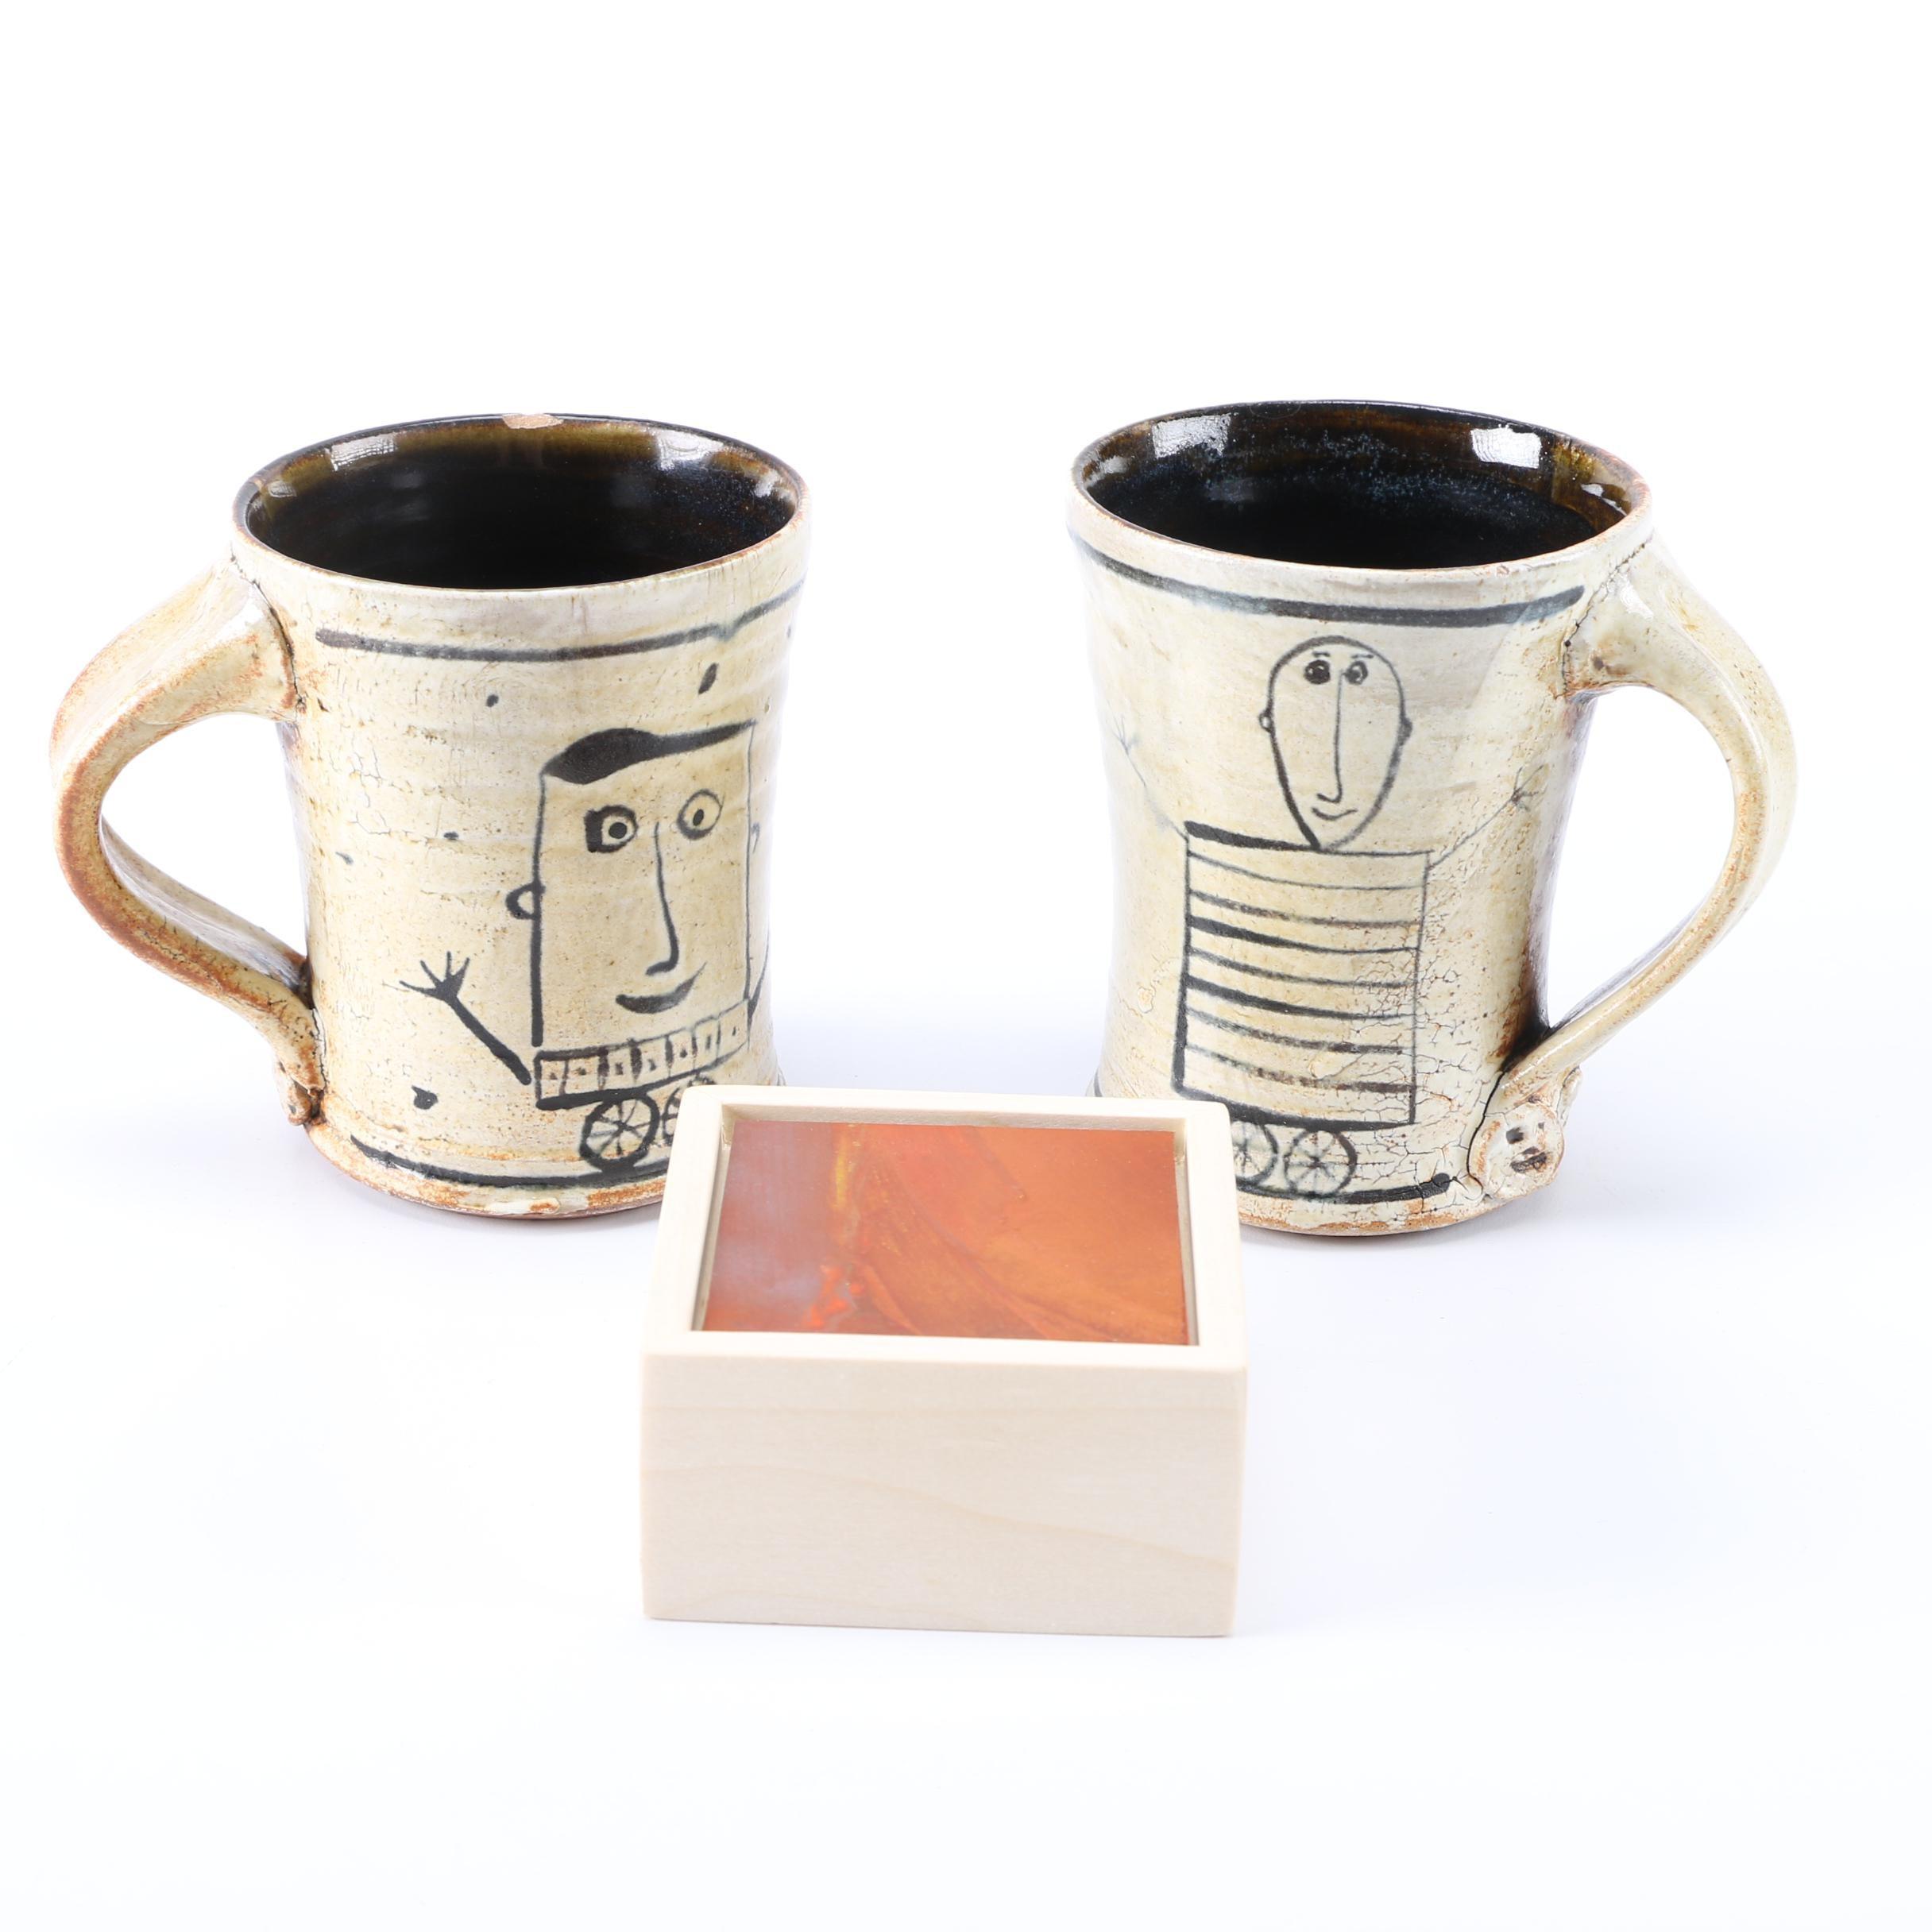 Handmade Mugs and Small Signed Painting